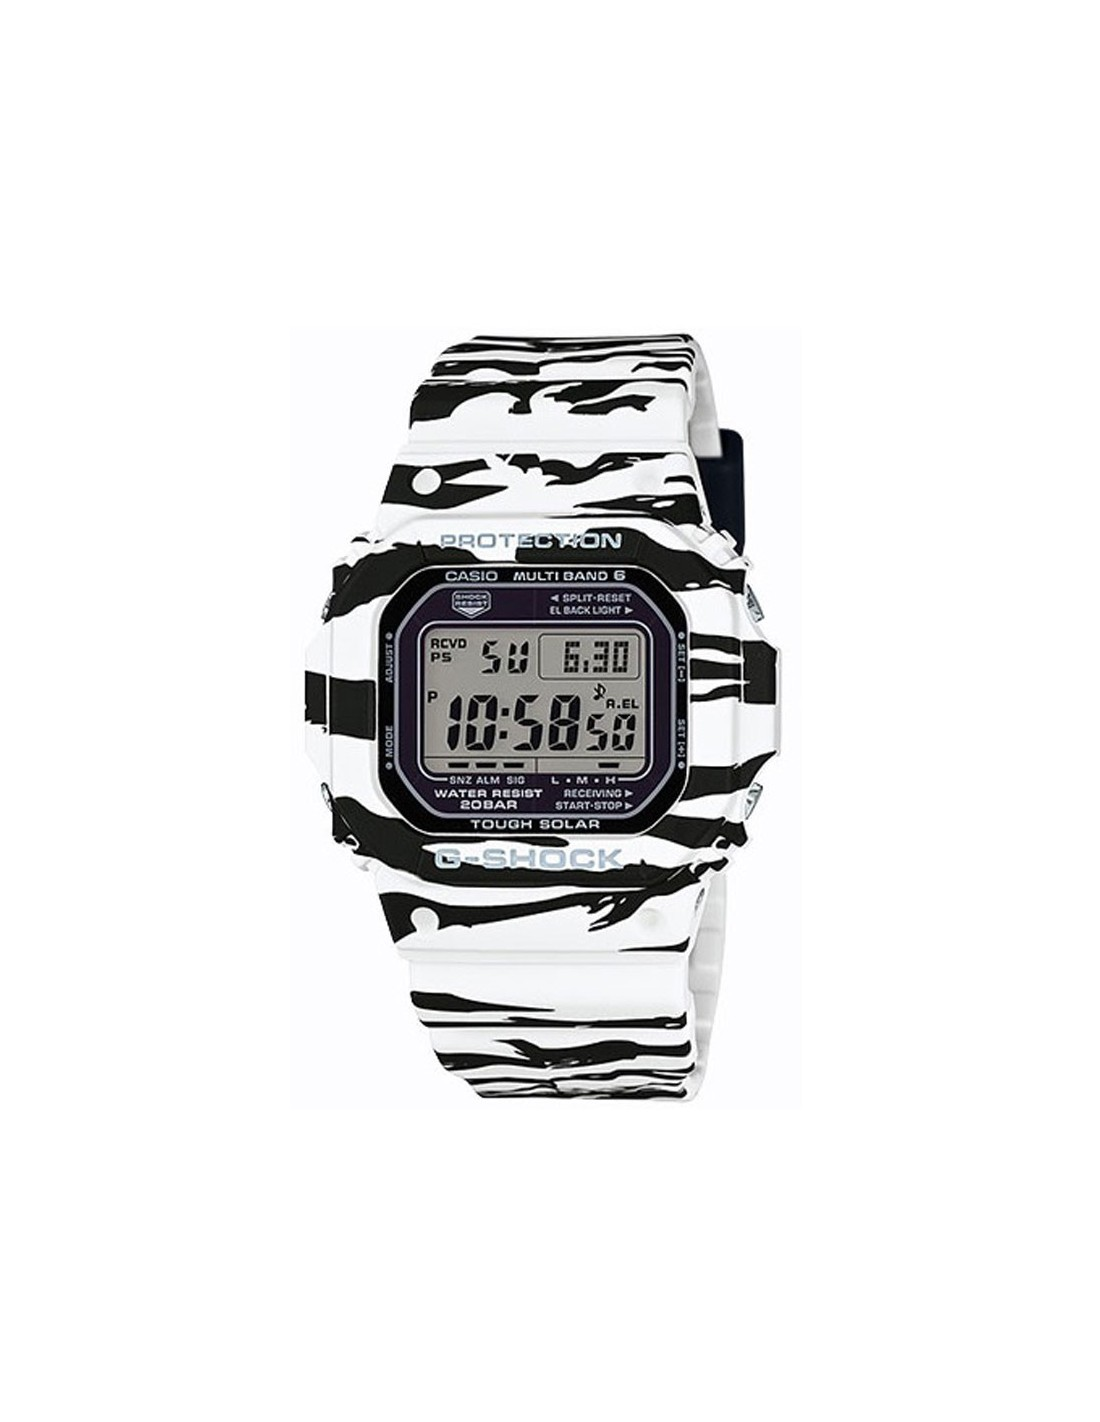 9f4d0e2279d Casio G-Shock Black   White ...